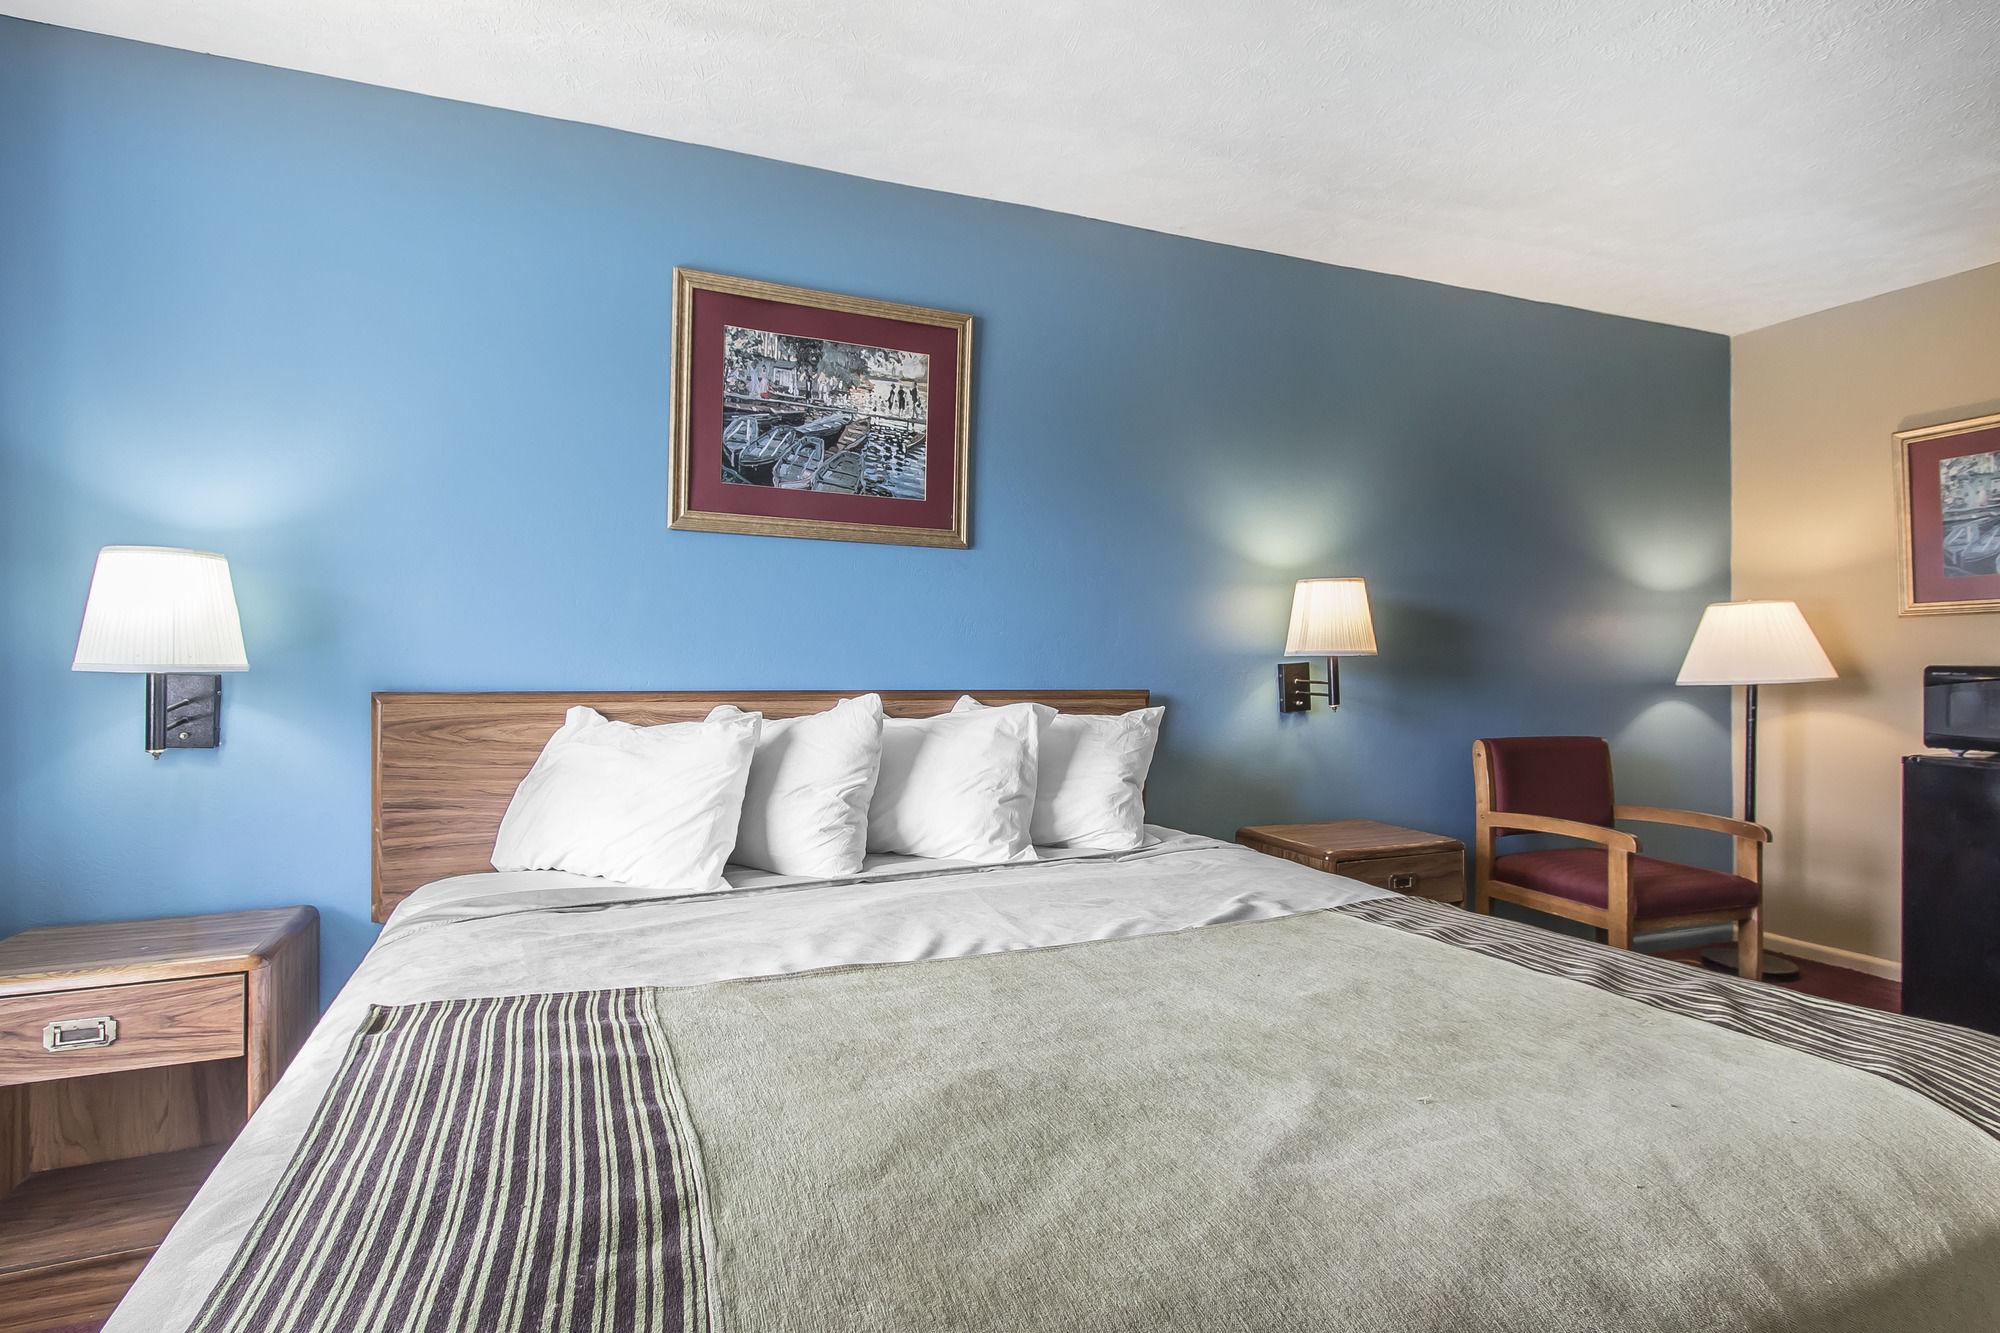 Rodeway Inn & Suites in Jackson, TN